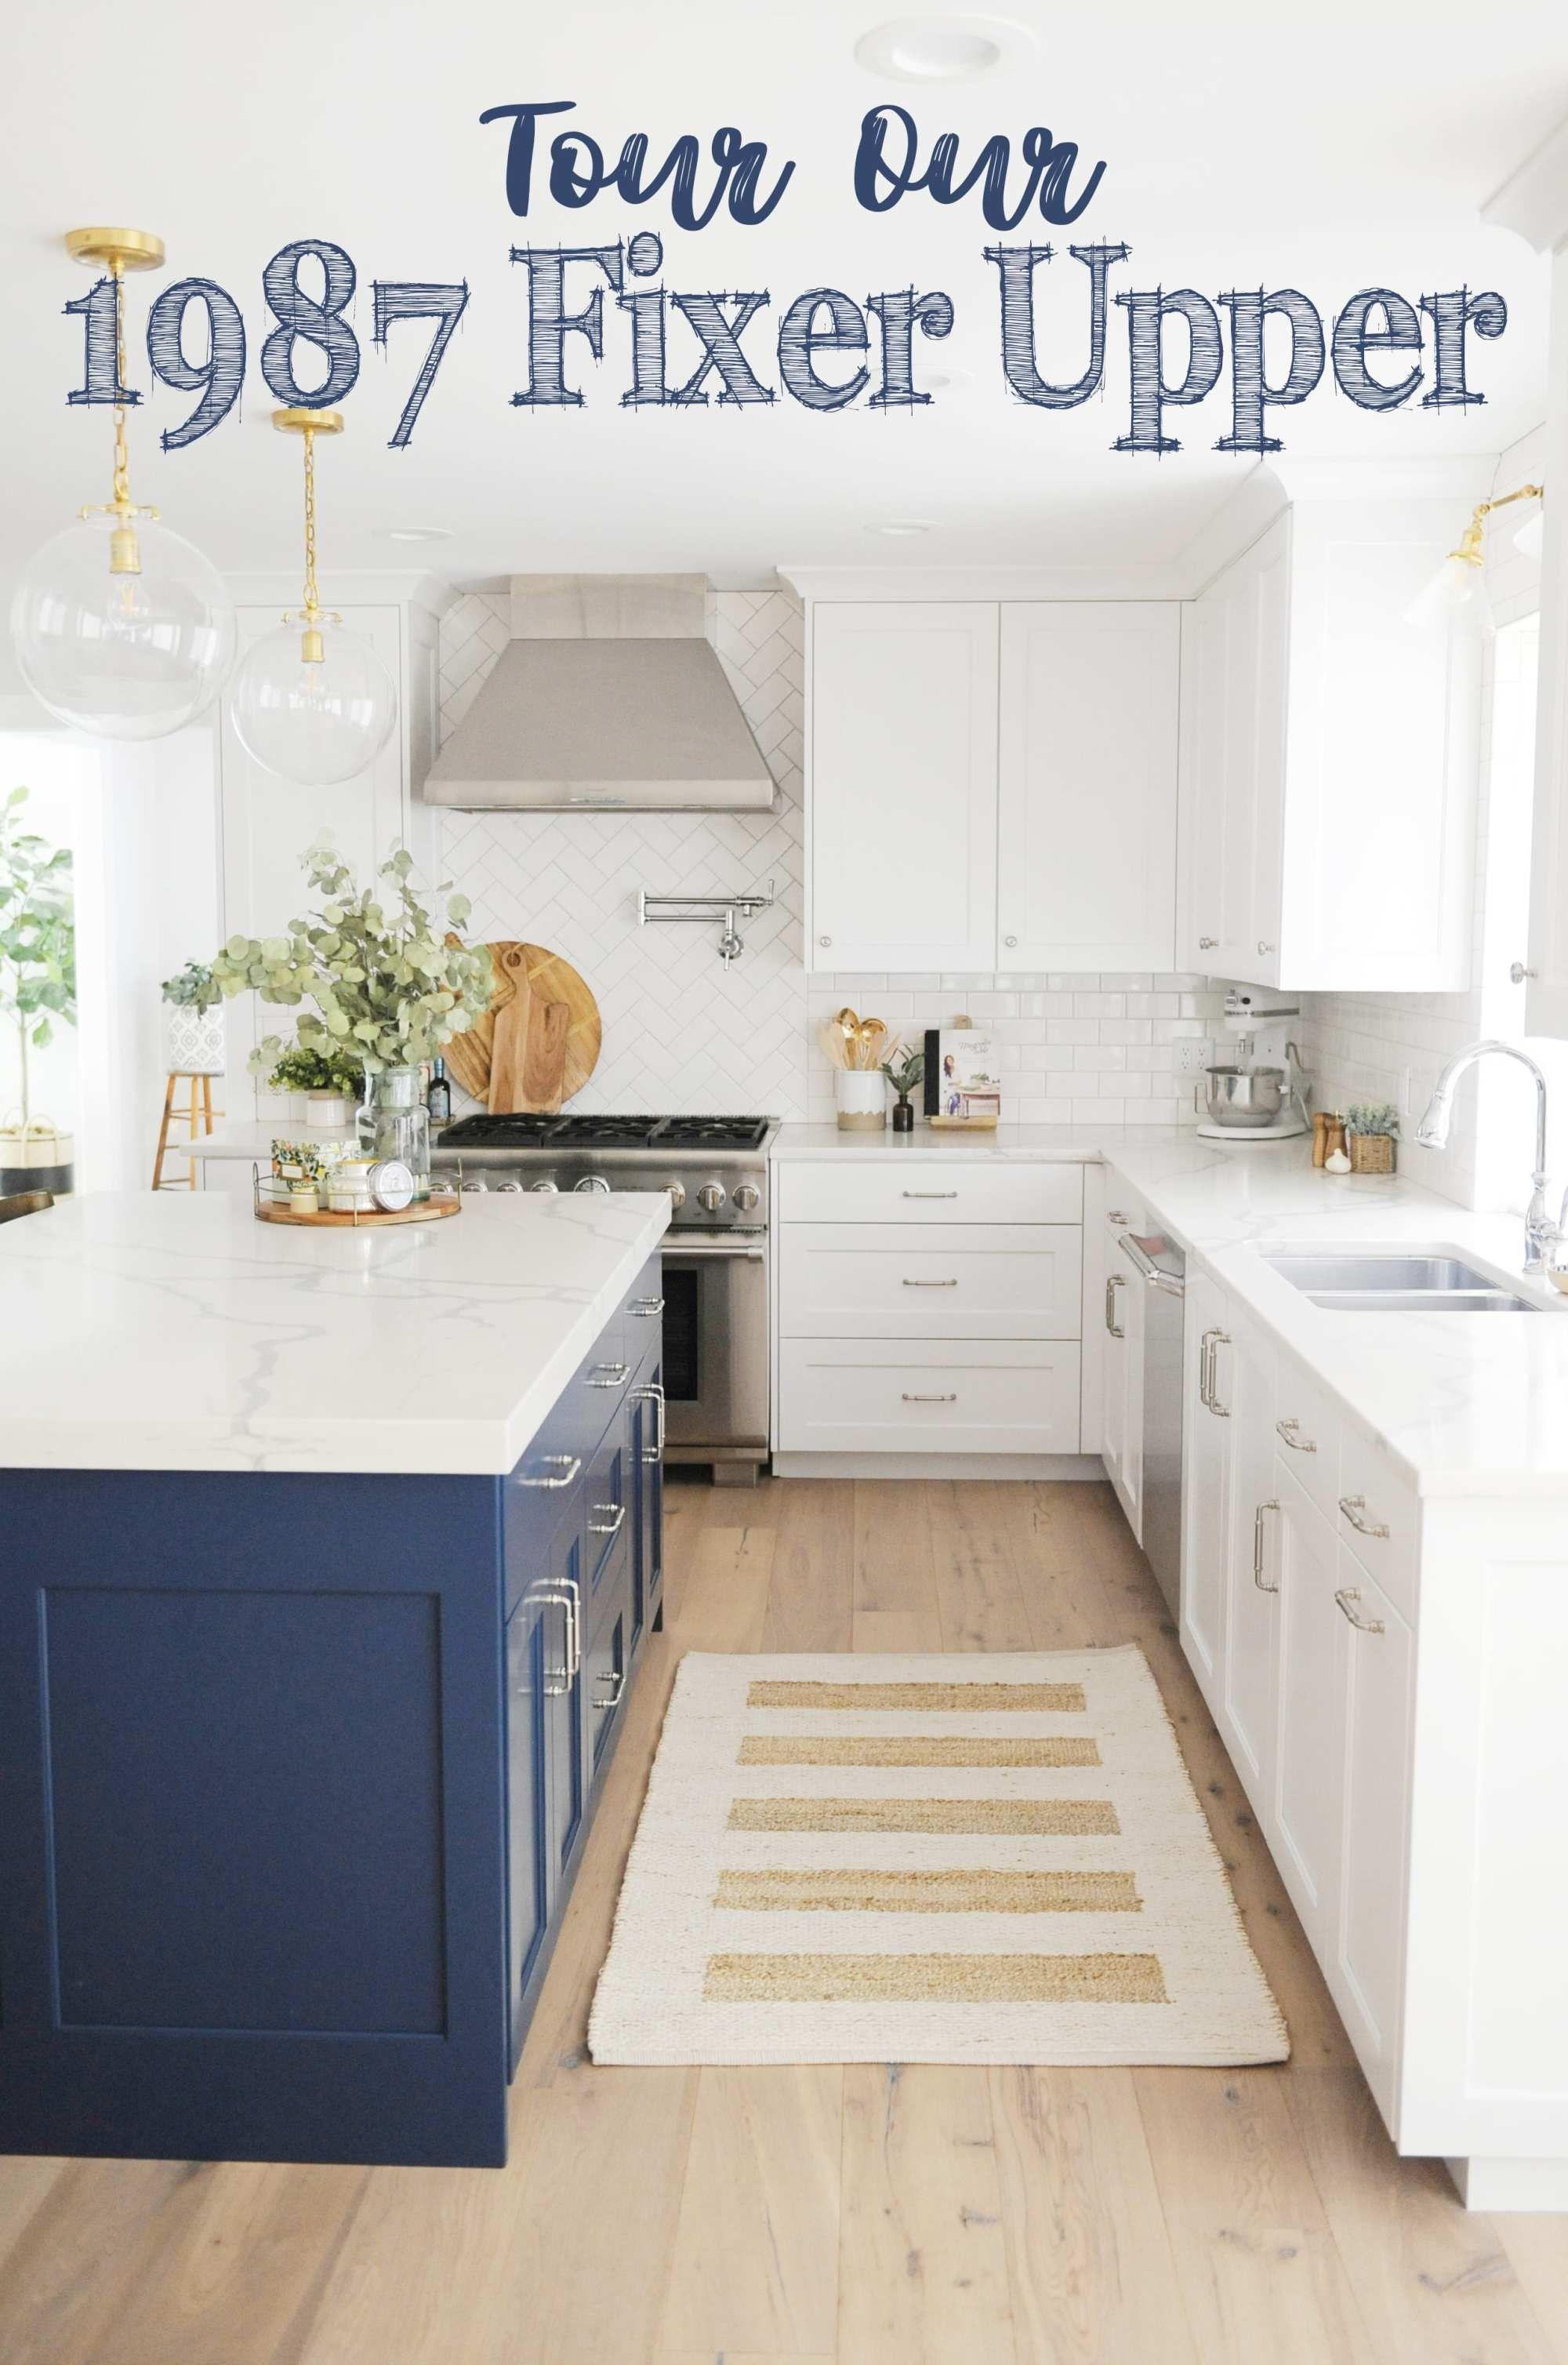 Current Home Tour Our 1987 Fixer Upper In 2020 Fixer Upper Kitchen Kitchen Remodel Kitchen Decor